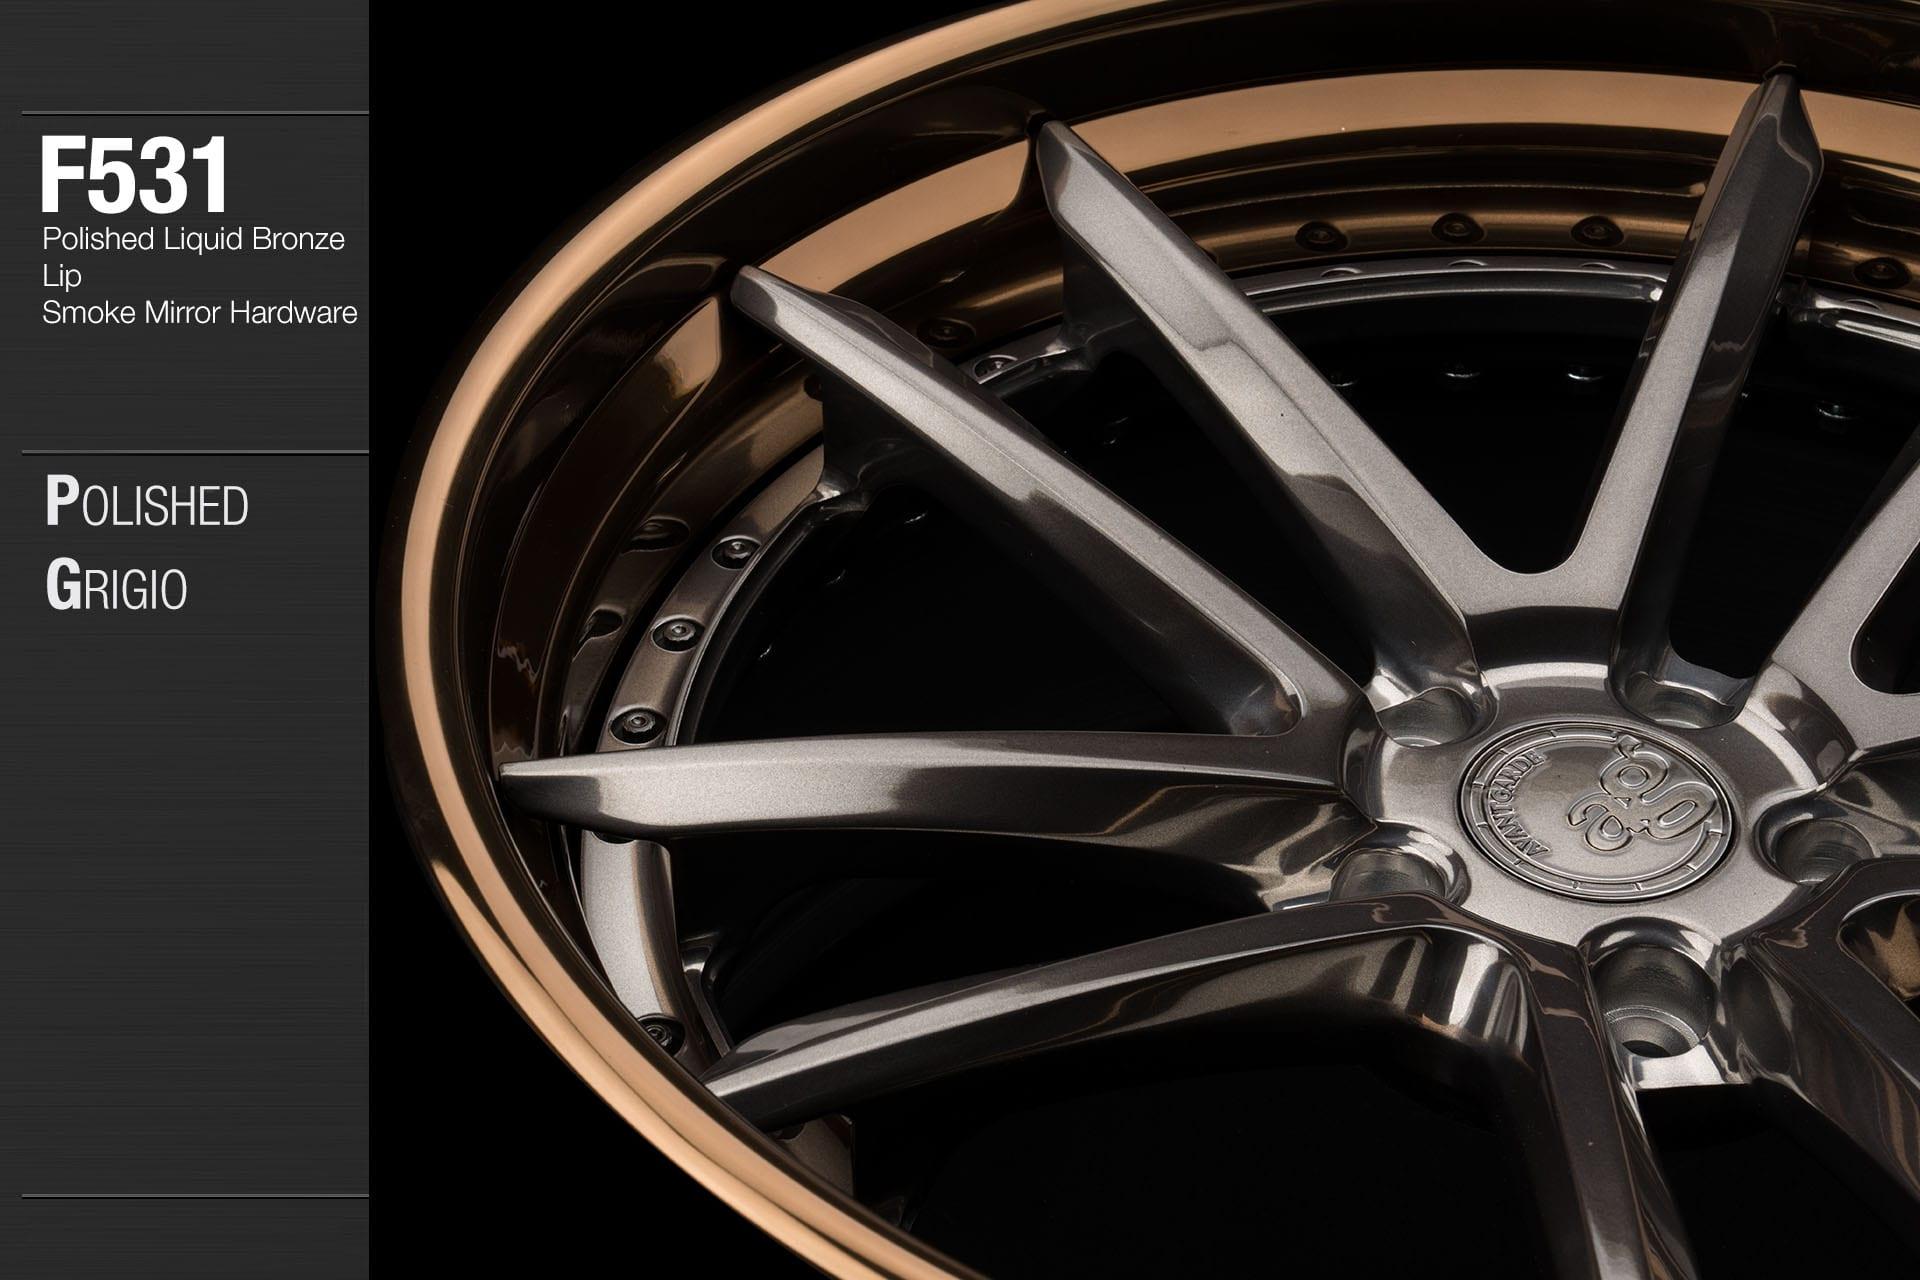 avant-garde-ag-wheels-f531-polished-grigio-face-liquid-bronze-lip-smoke-mirror-hardware-2-min